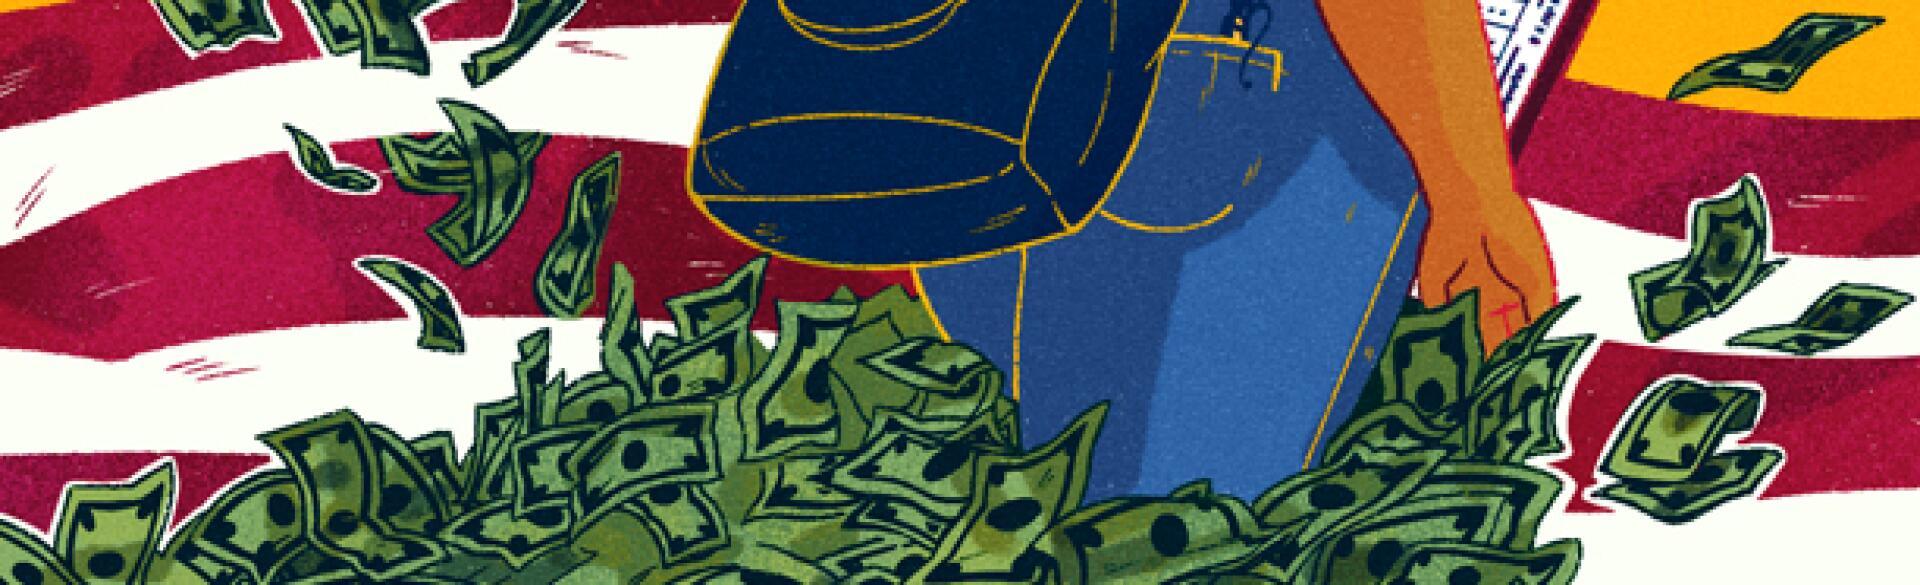 illustration of lady being followed by sidehustle money by islenia mil